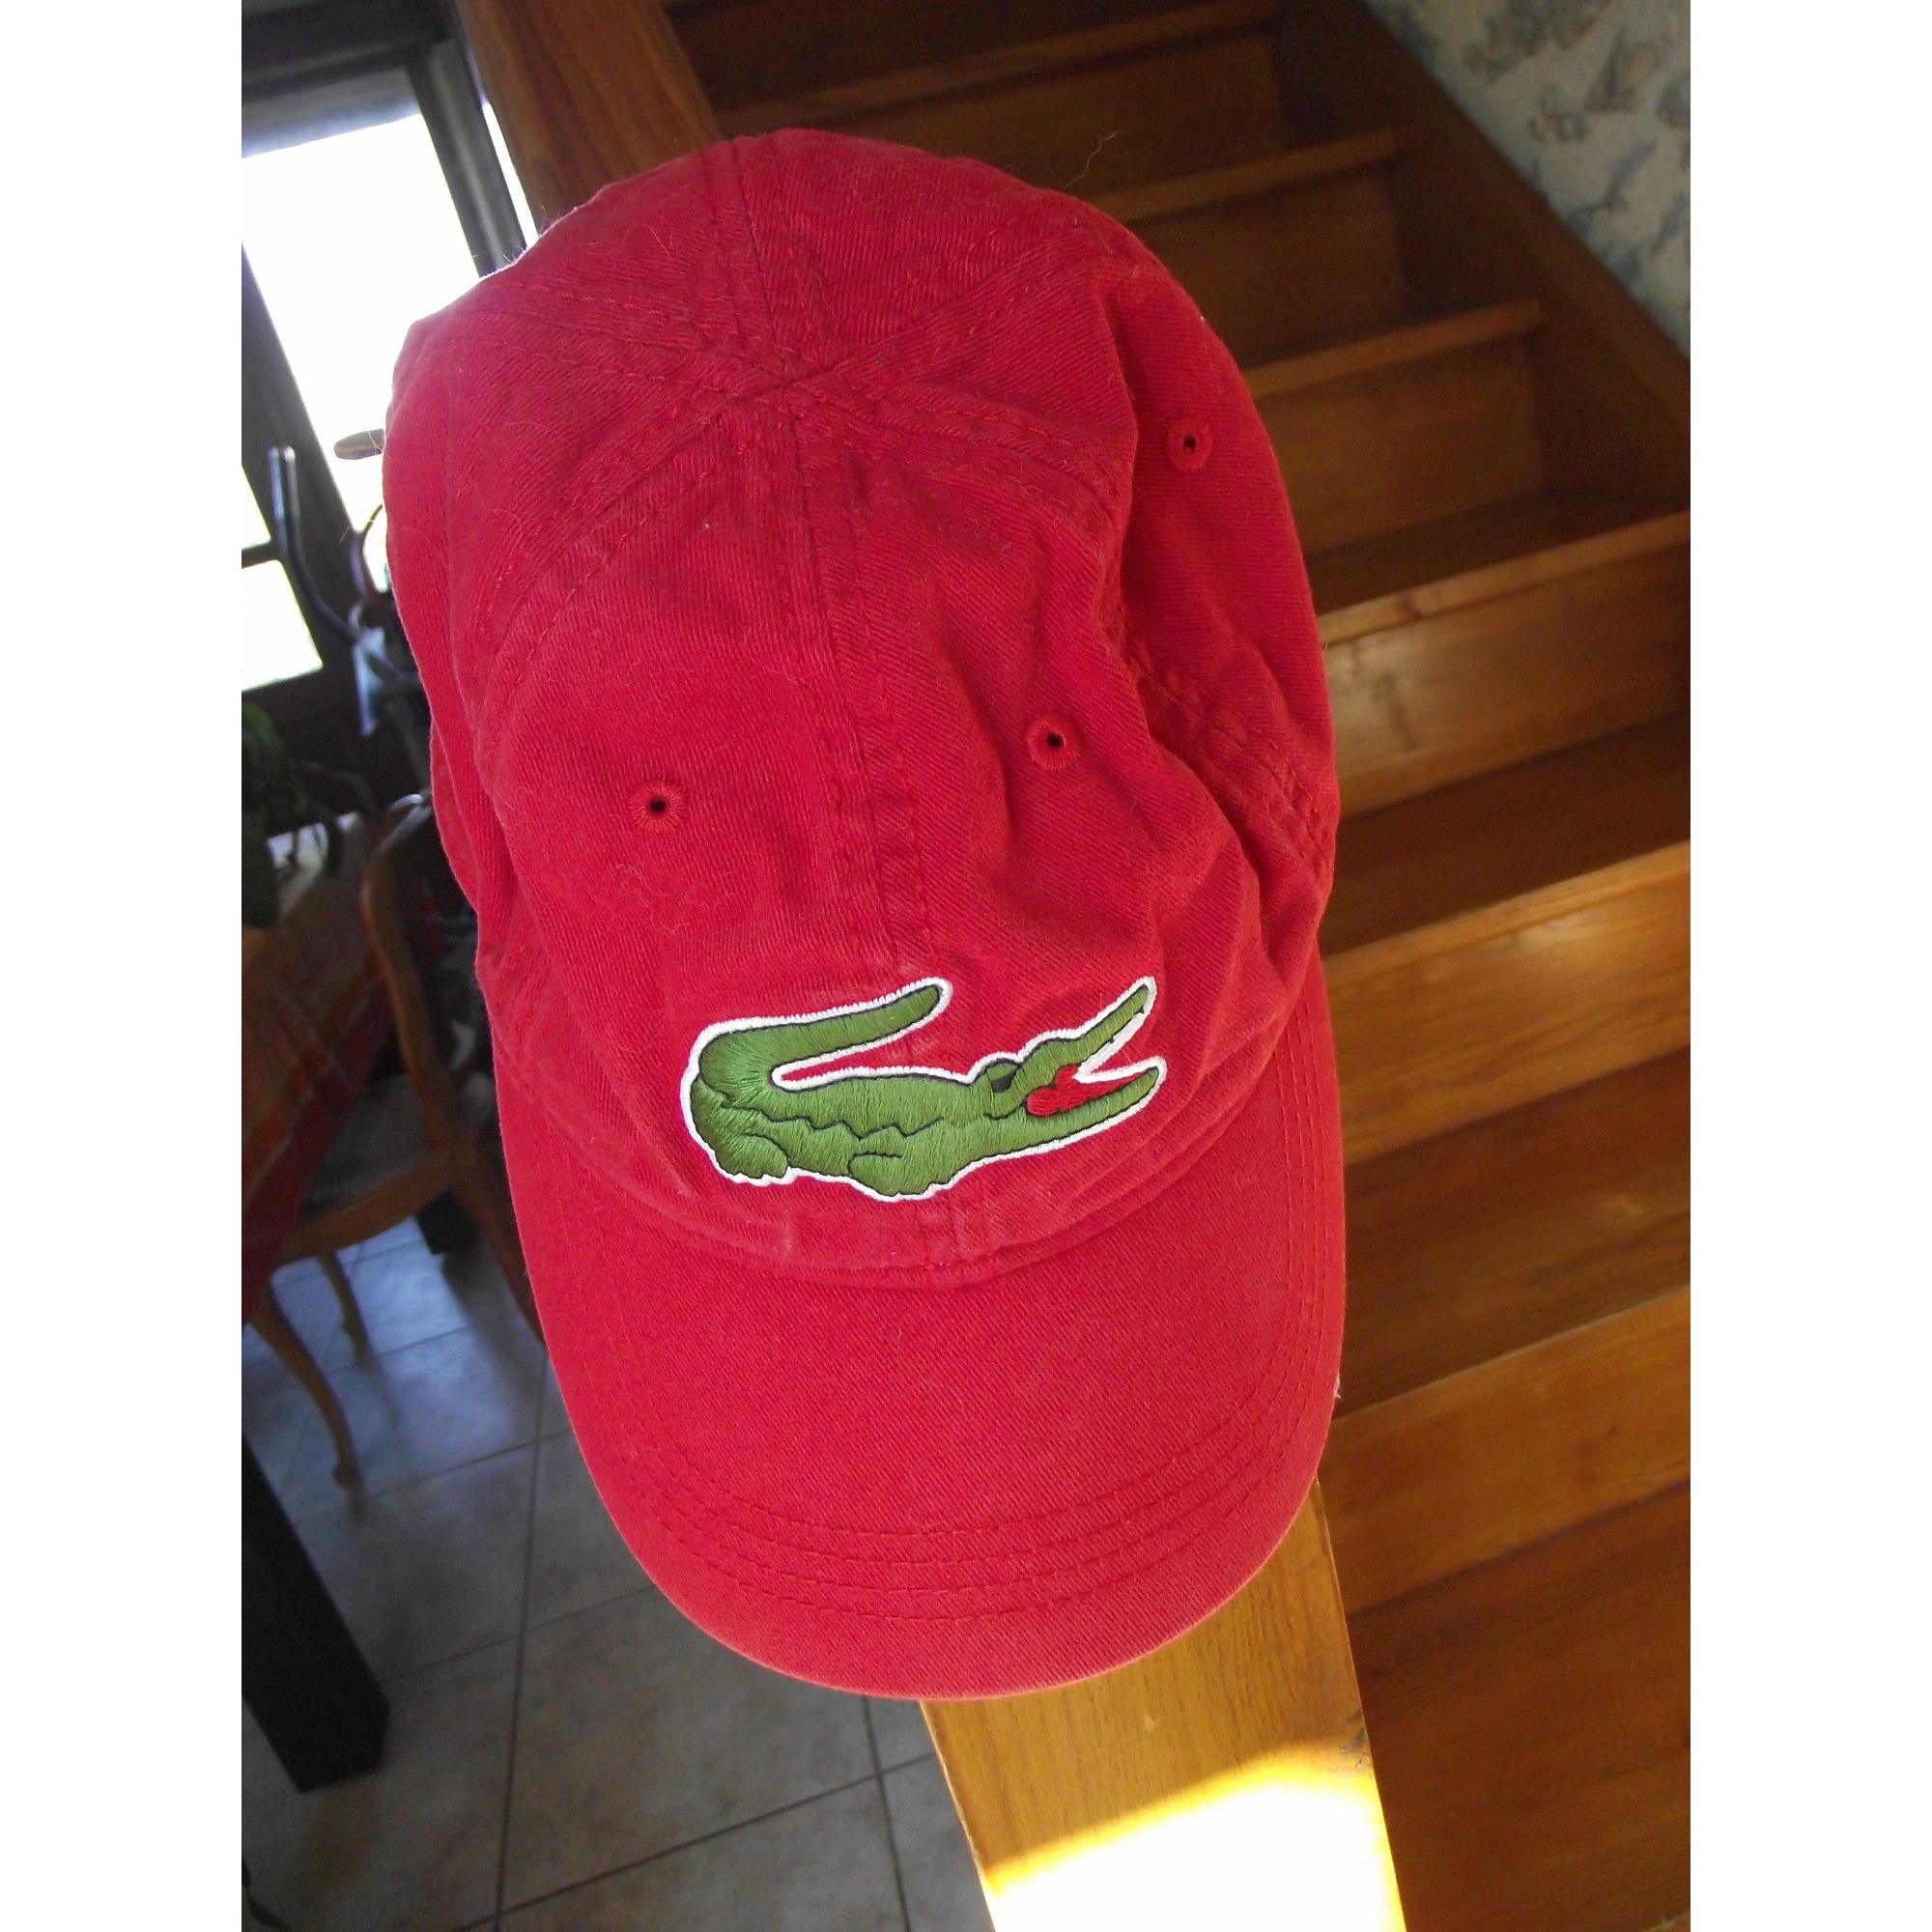 b4812c6f7e7 Cap LACOSTE One rouge vendu par Caroline 4220 - 3359672